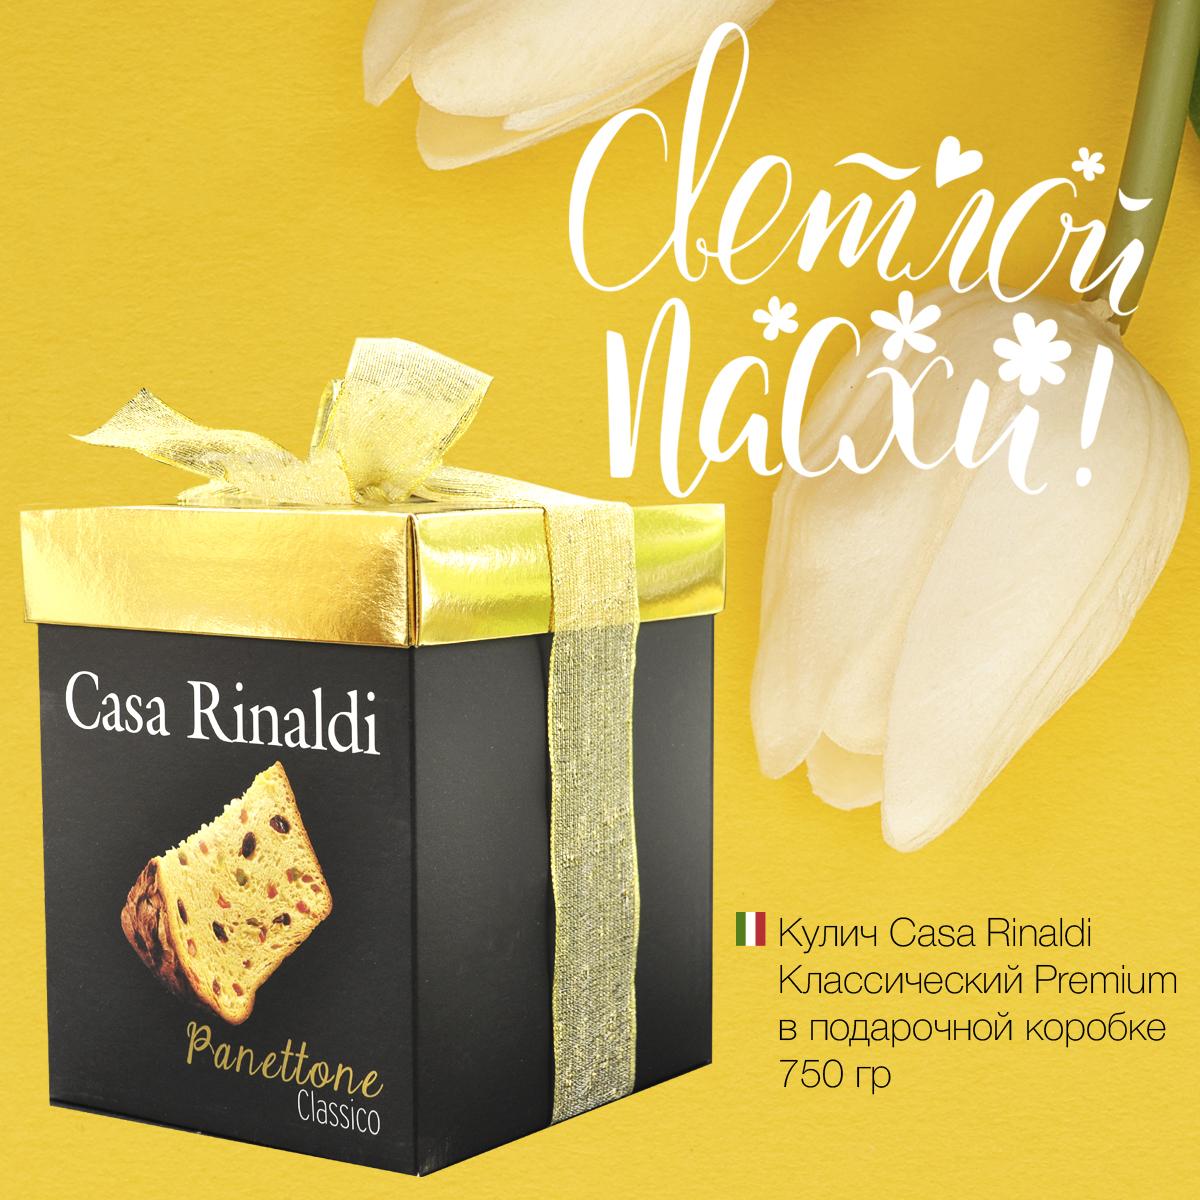 Кулич Casa Rinaldi классический PREMIUM, 750г